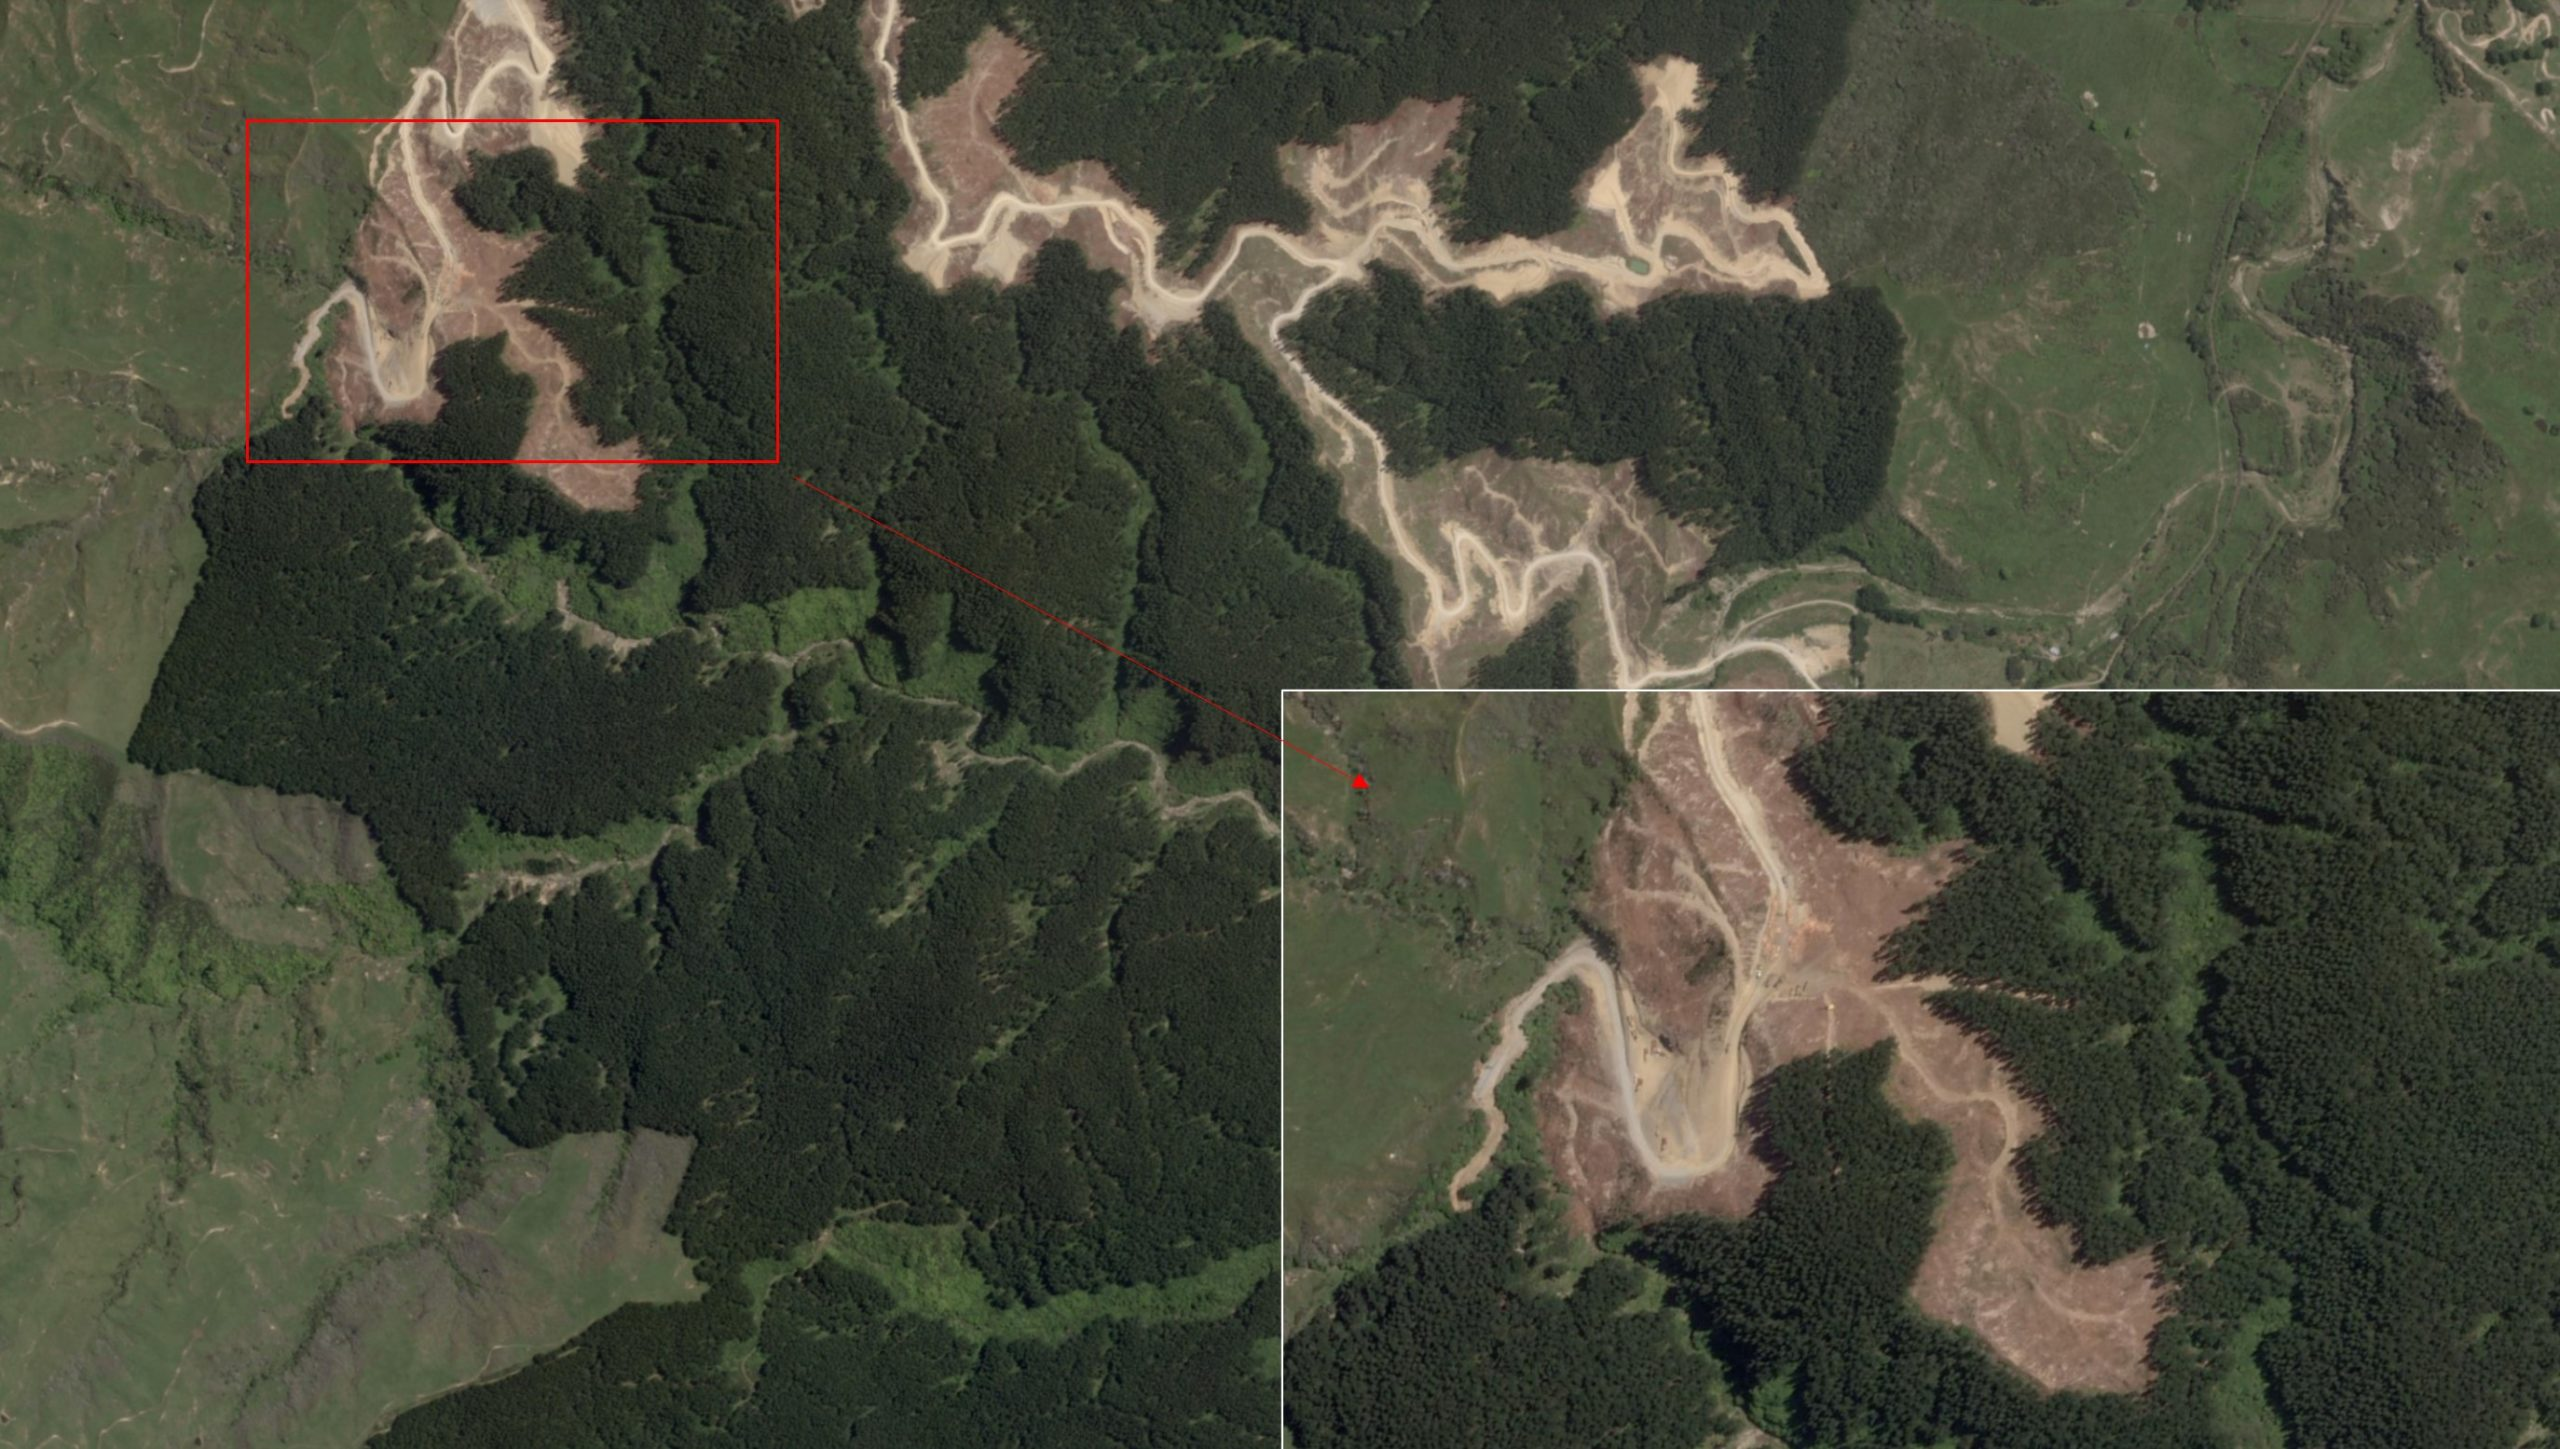 Planet SkySat Roadline Harvesting Operations